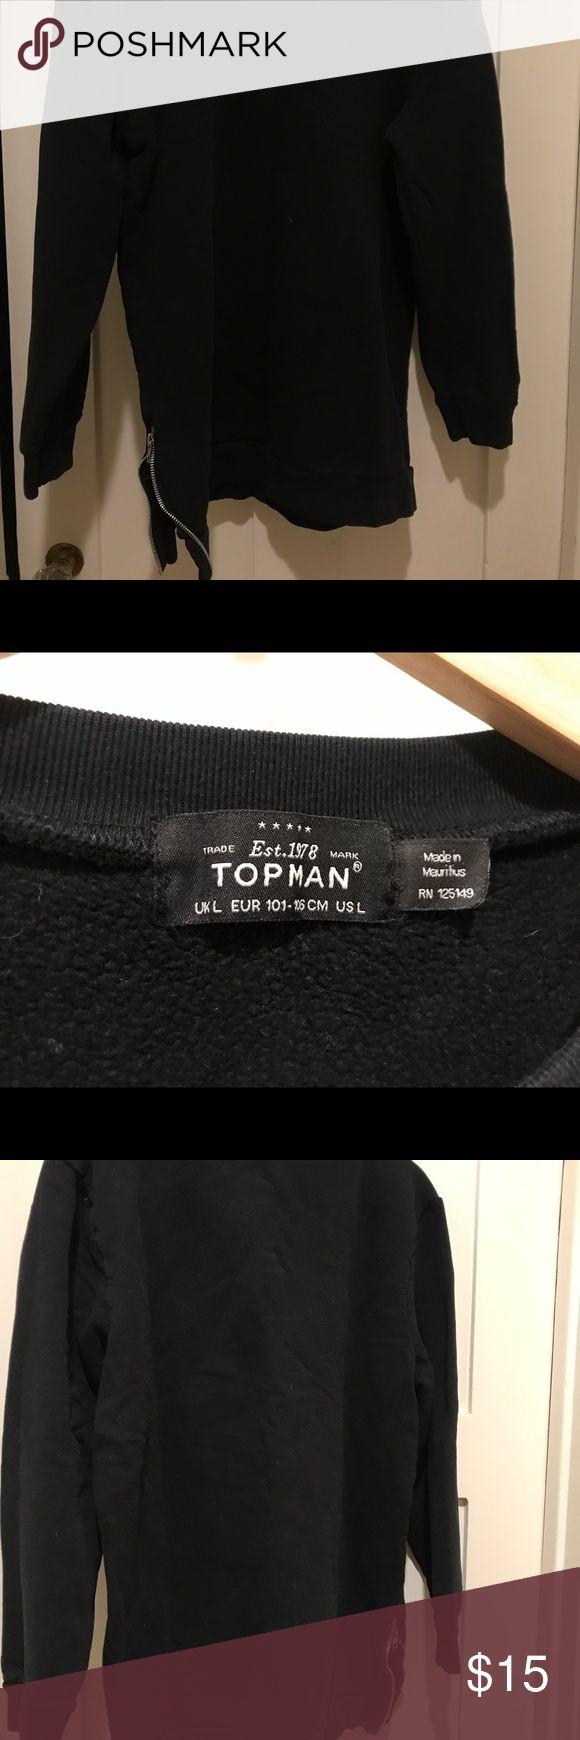 Black Crew Neck Jacket Black Crew Neck Sweatshirt Topman Jackets & Coats Lightweight & Shirt Jackets